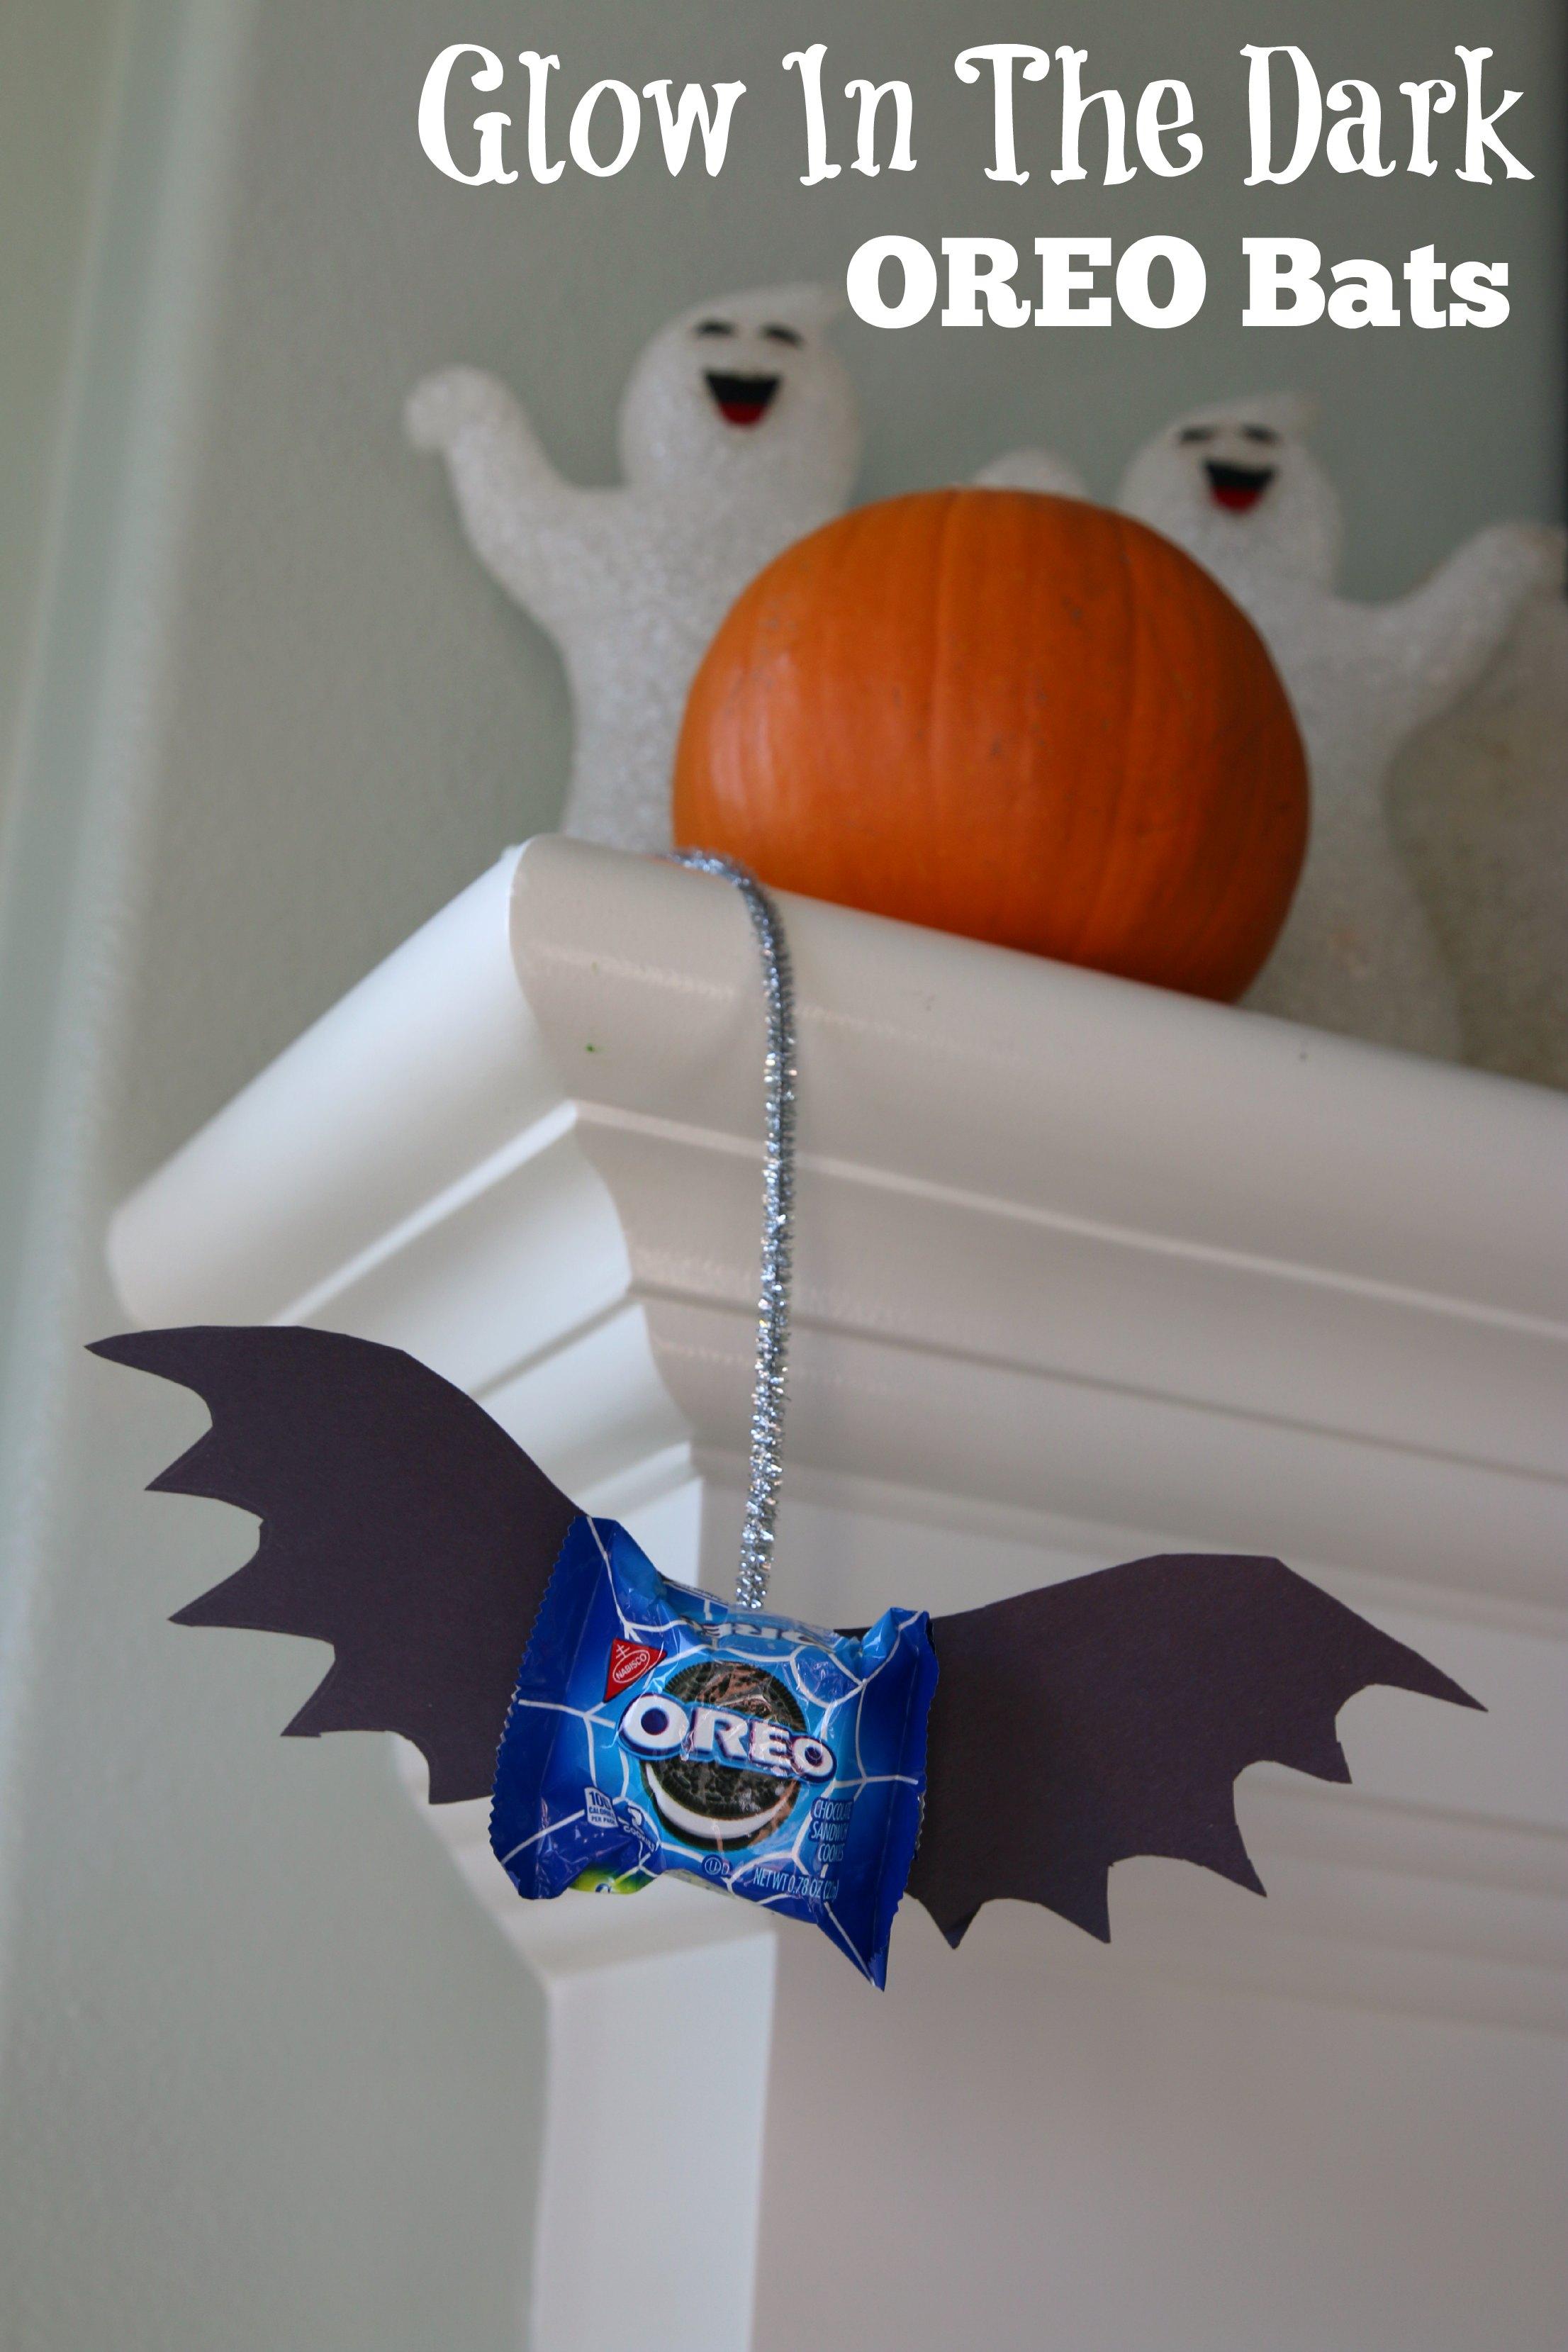 glow in the dark oreo bats